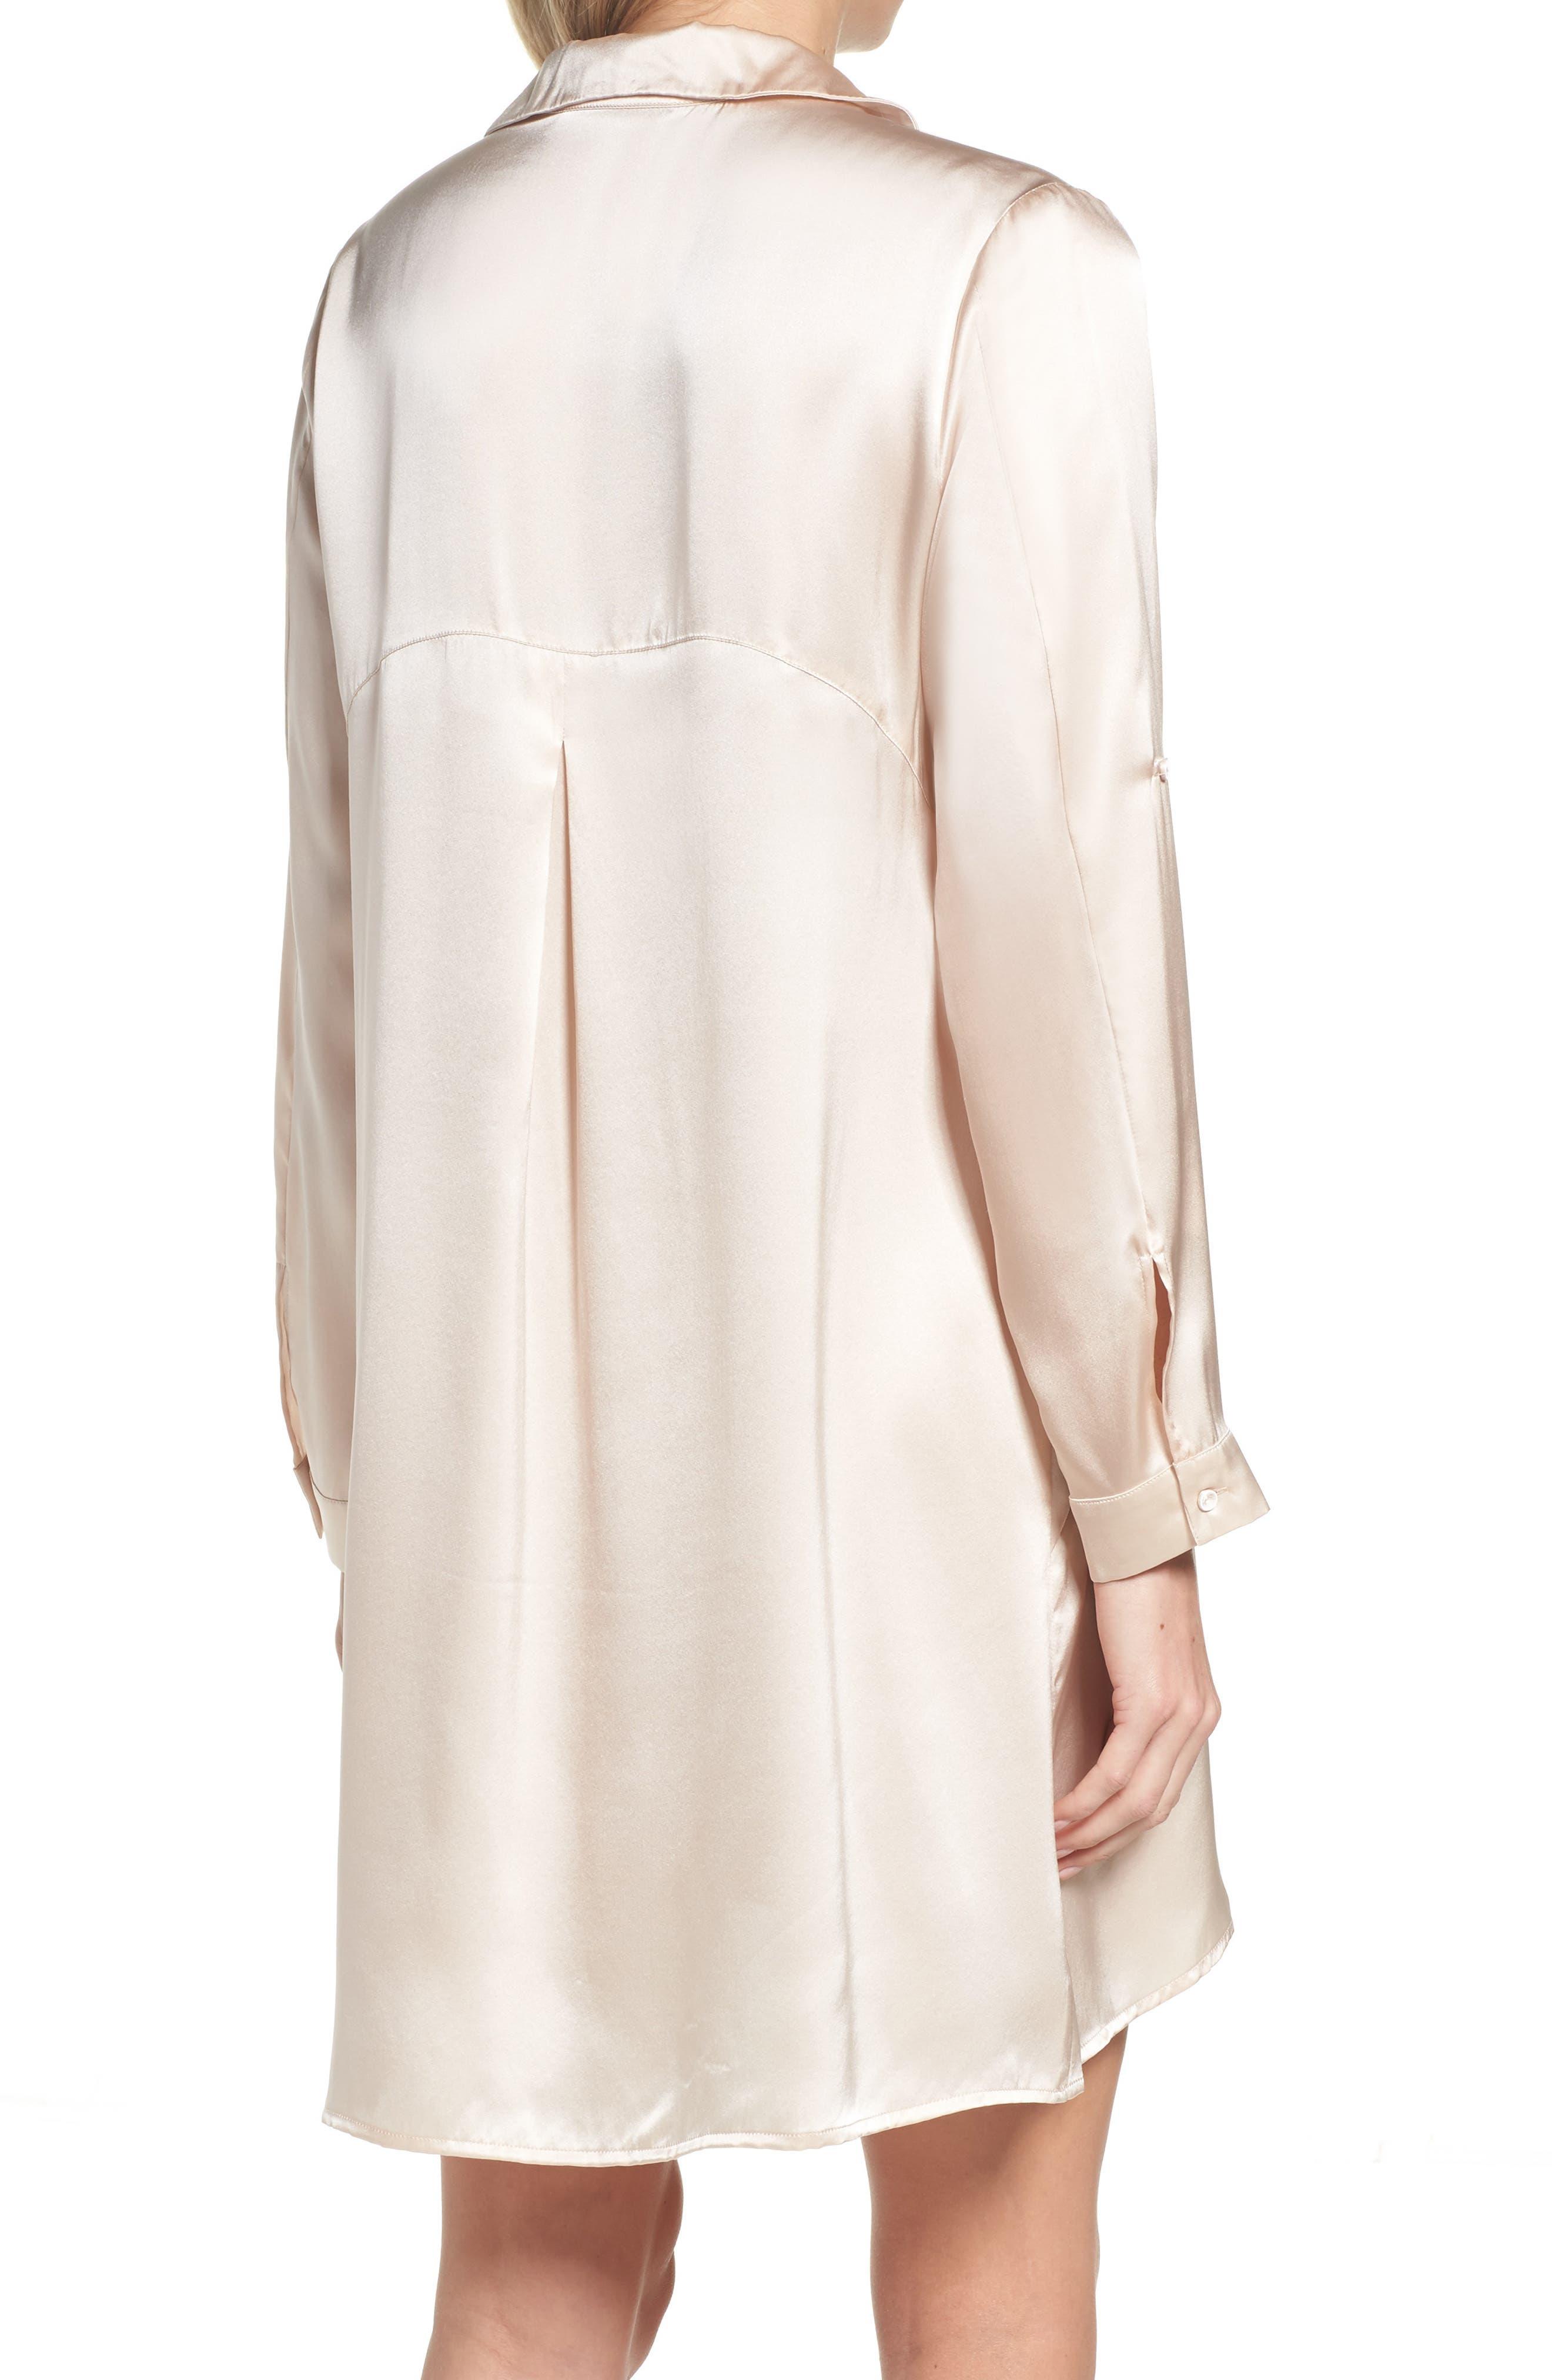 Silk Sleep Shirt,                             Alternate thumbnail 2, color,                             900